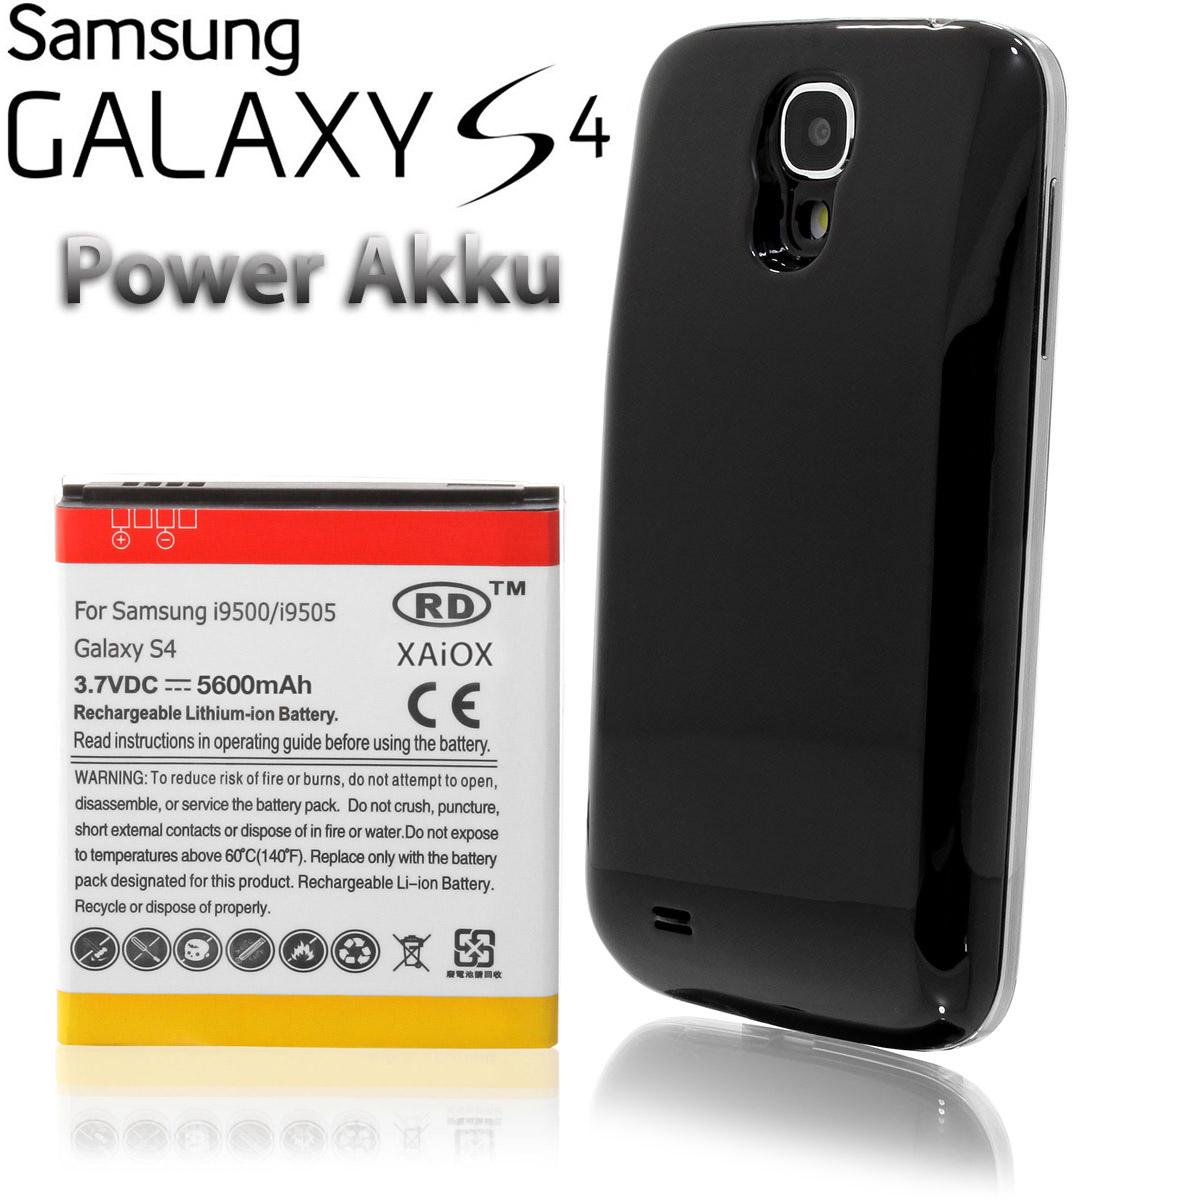 Samsung-Galaxy-S4-i9500-i9505-6200-mAh-Power-Akku-inkl-Akkudeckel-Case-schwar